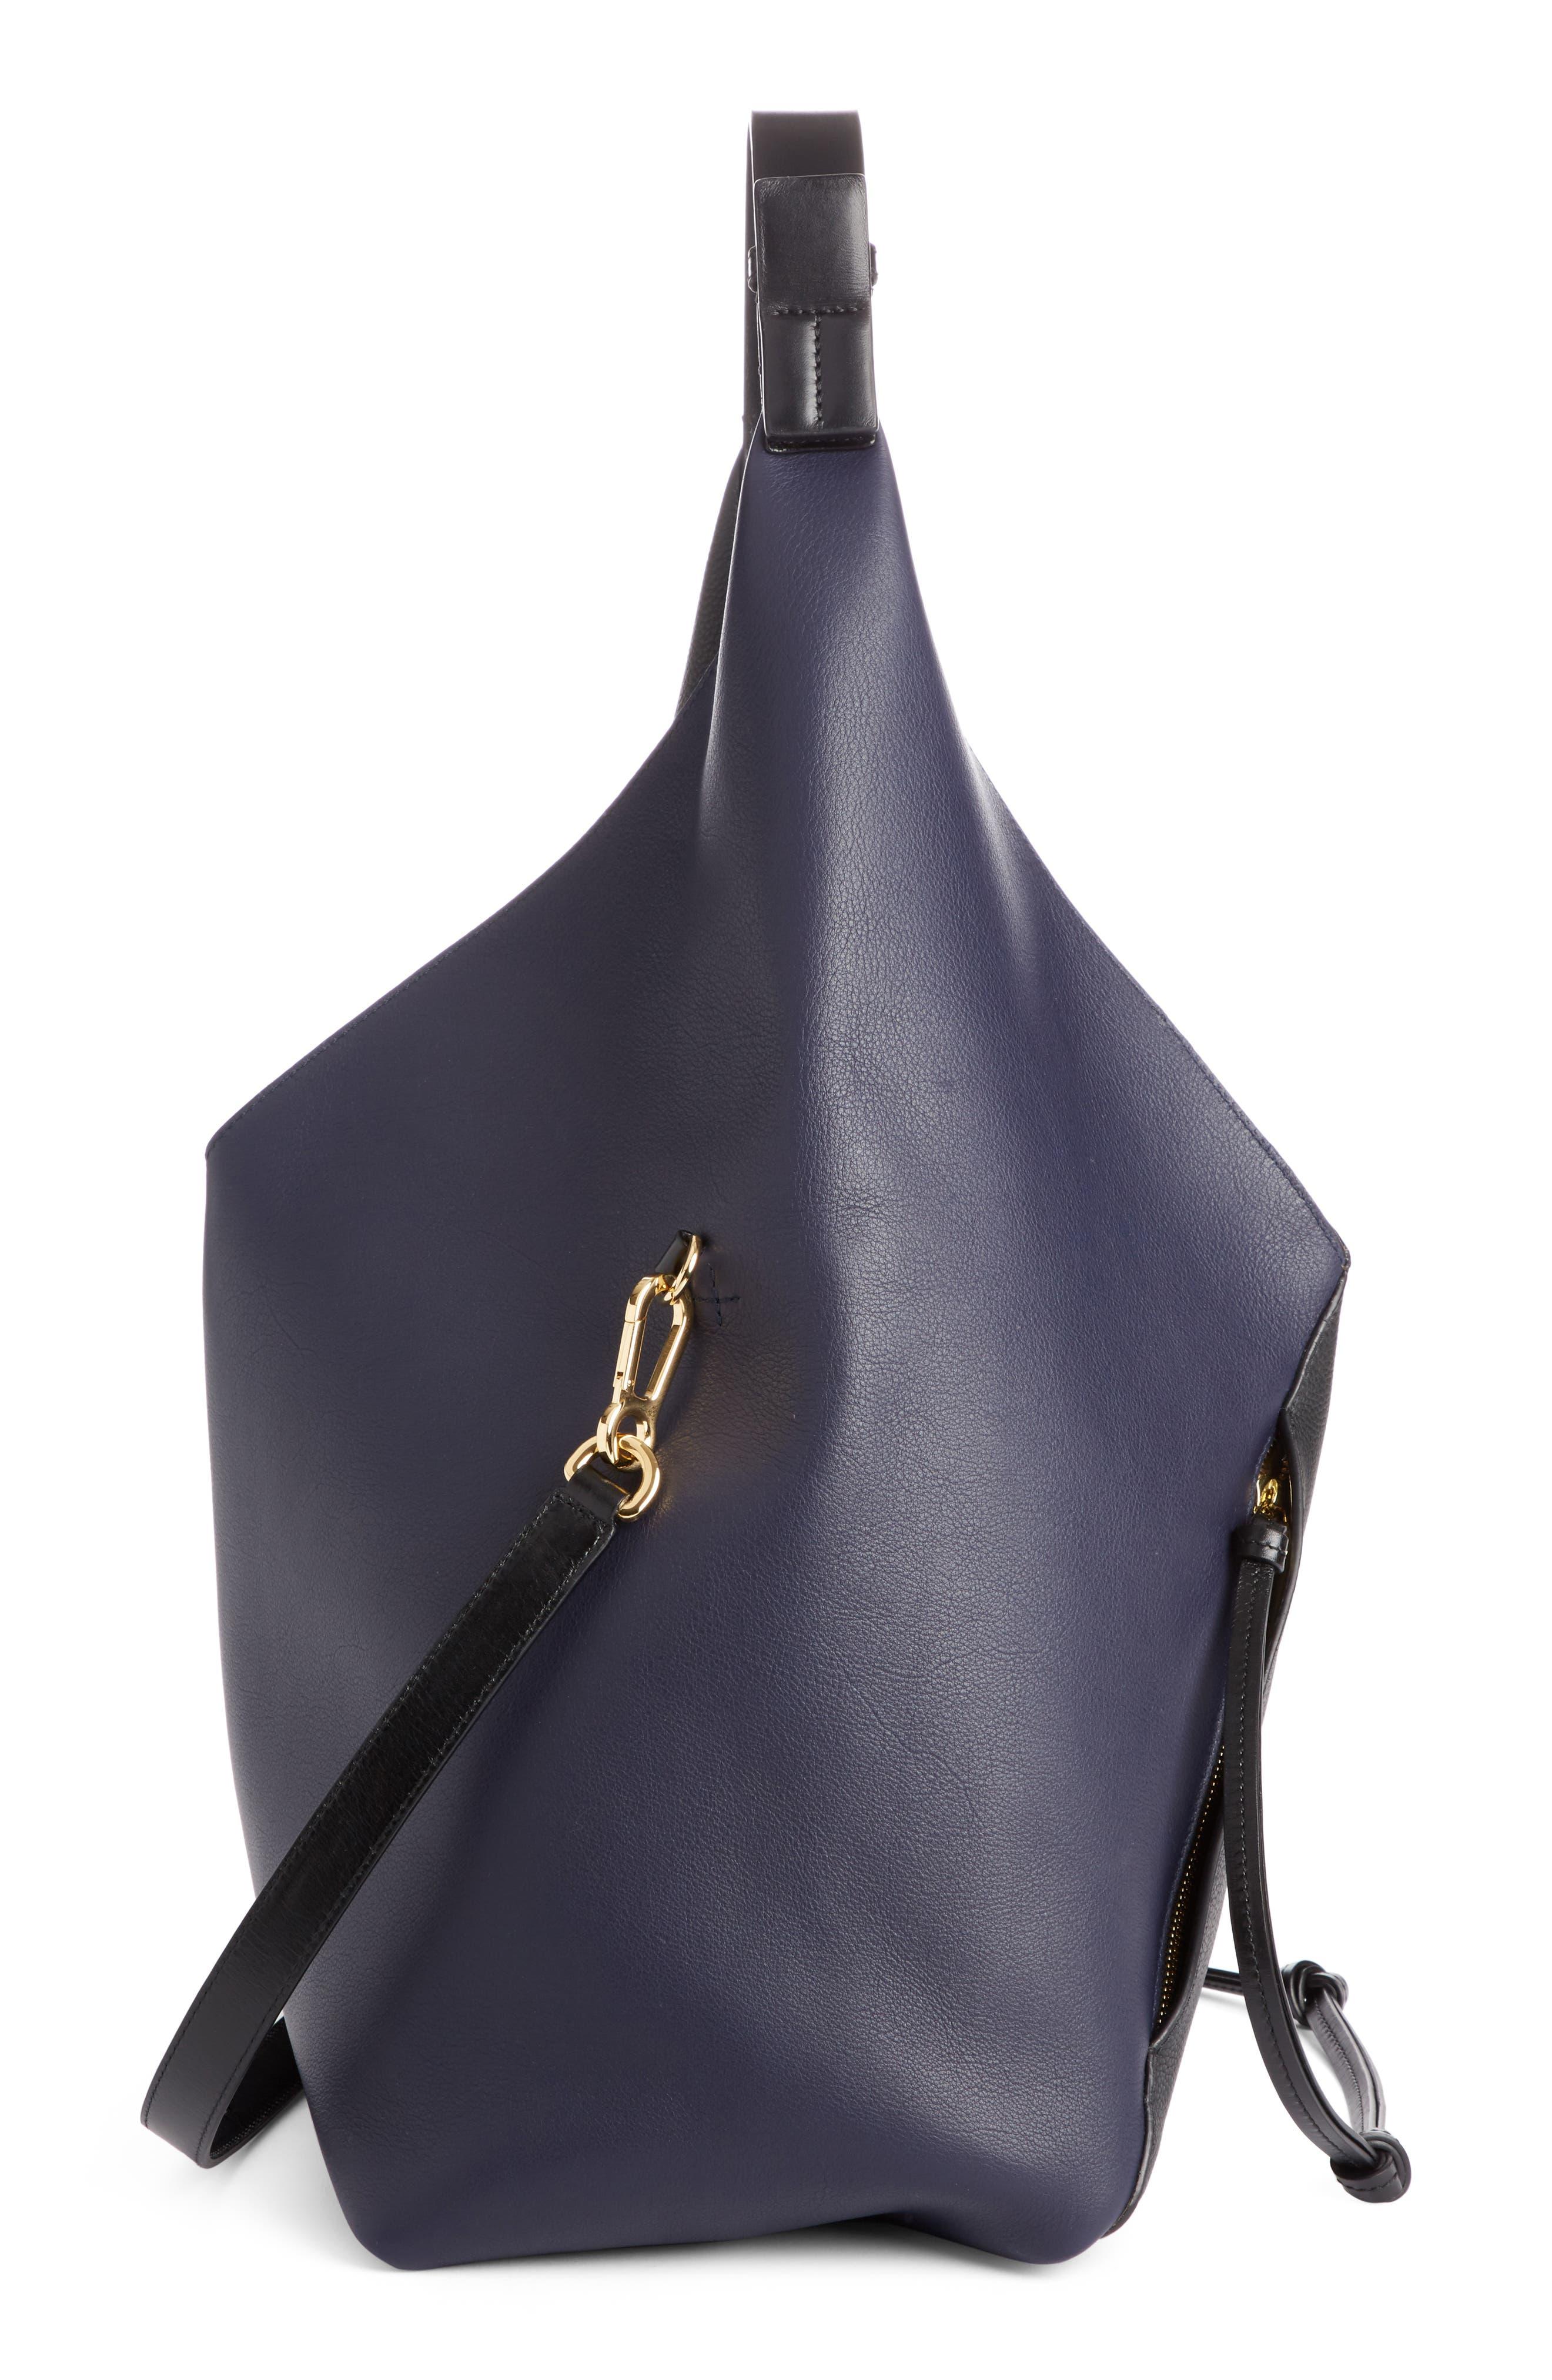 Calfskin Leather Sling Bag,                             Alternate thumbnail 4, color,                             Midnight Blue/ Black